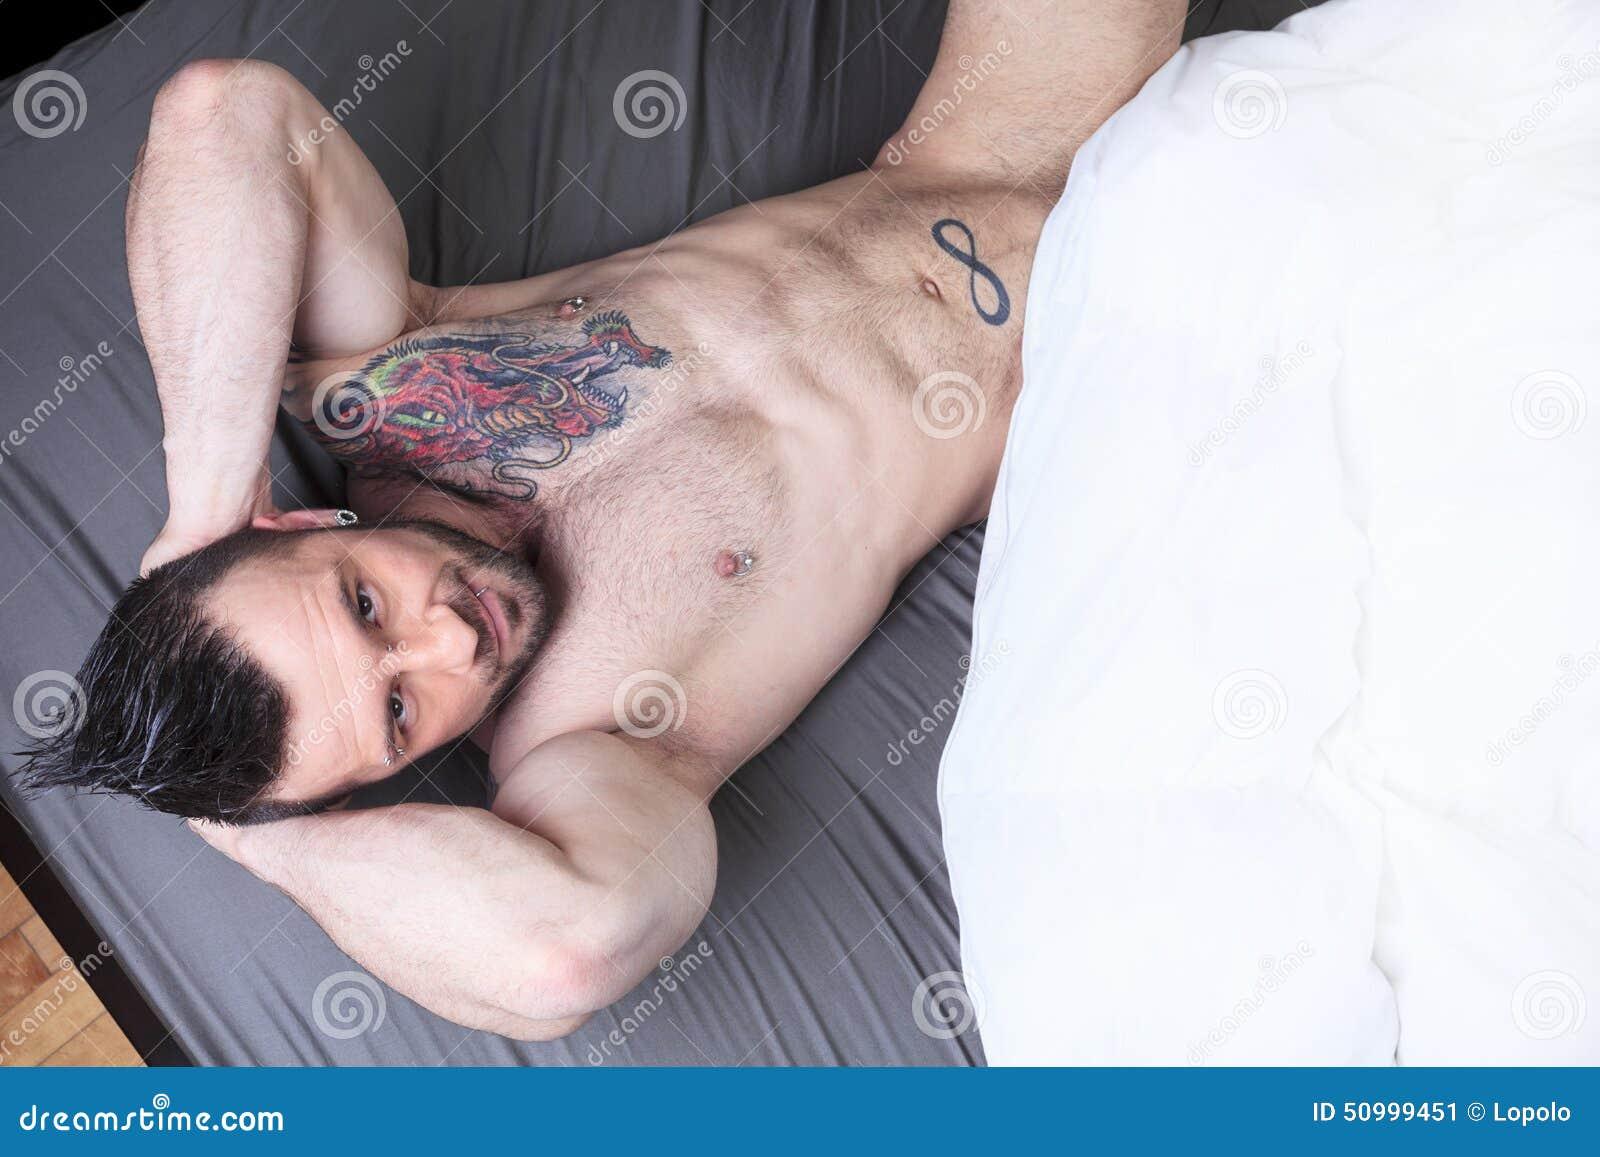 Vidos de sexe dans un lit - x-uvcom